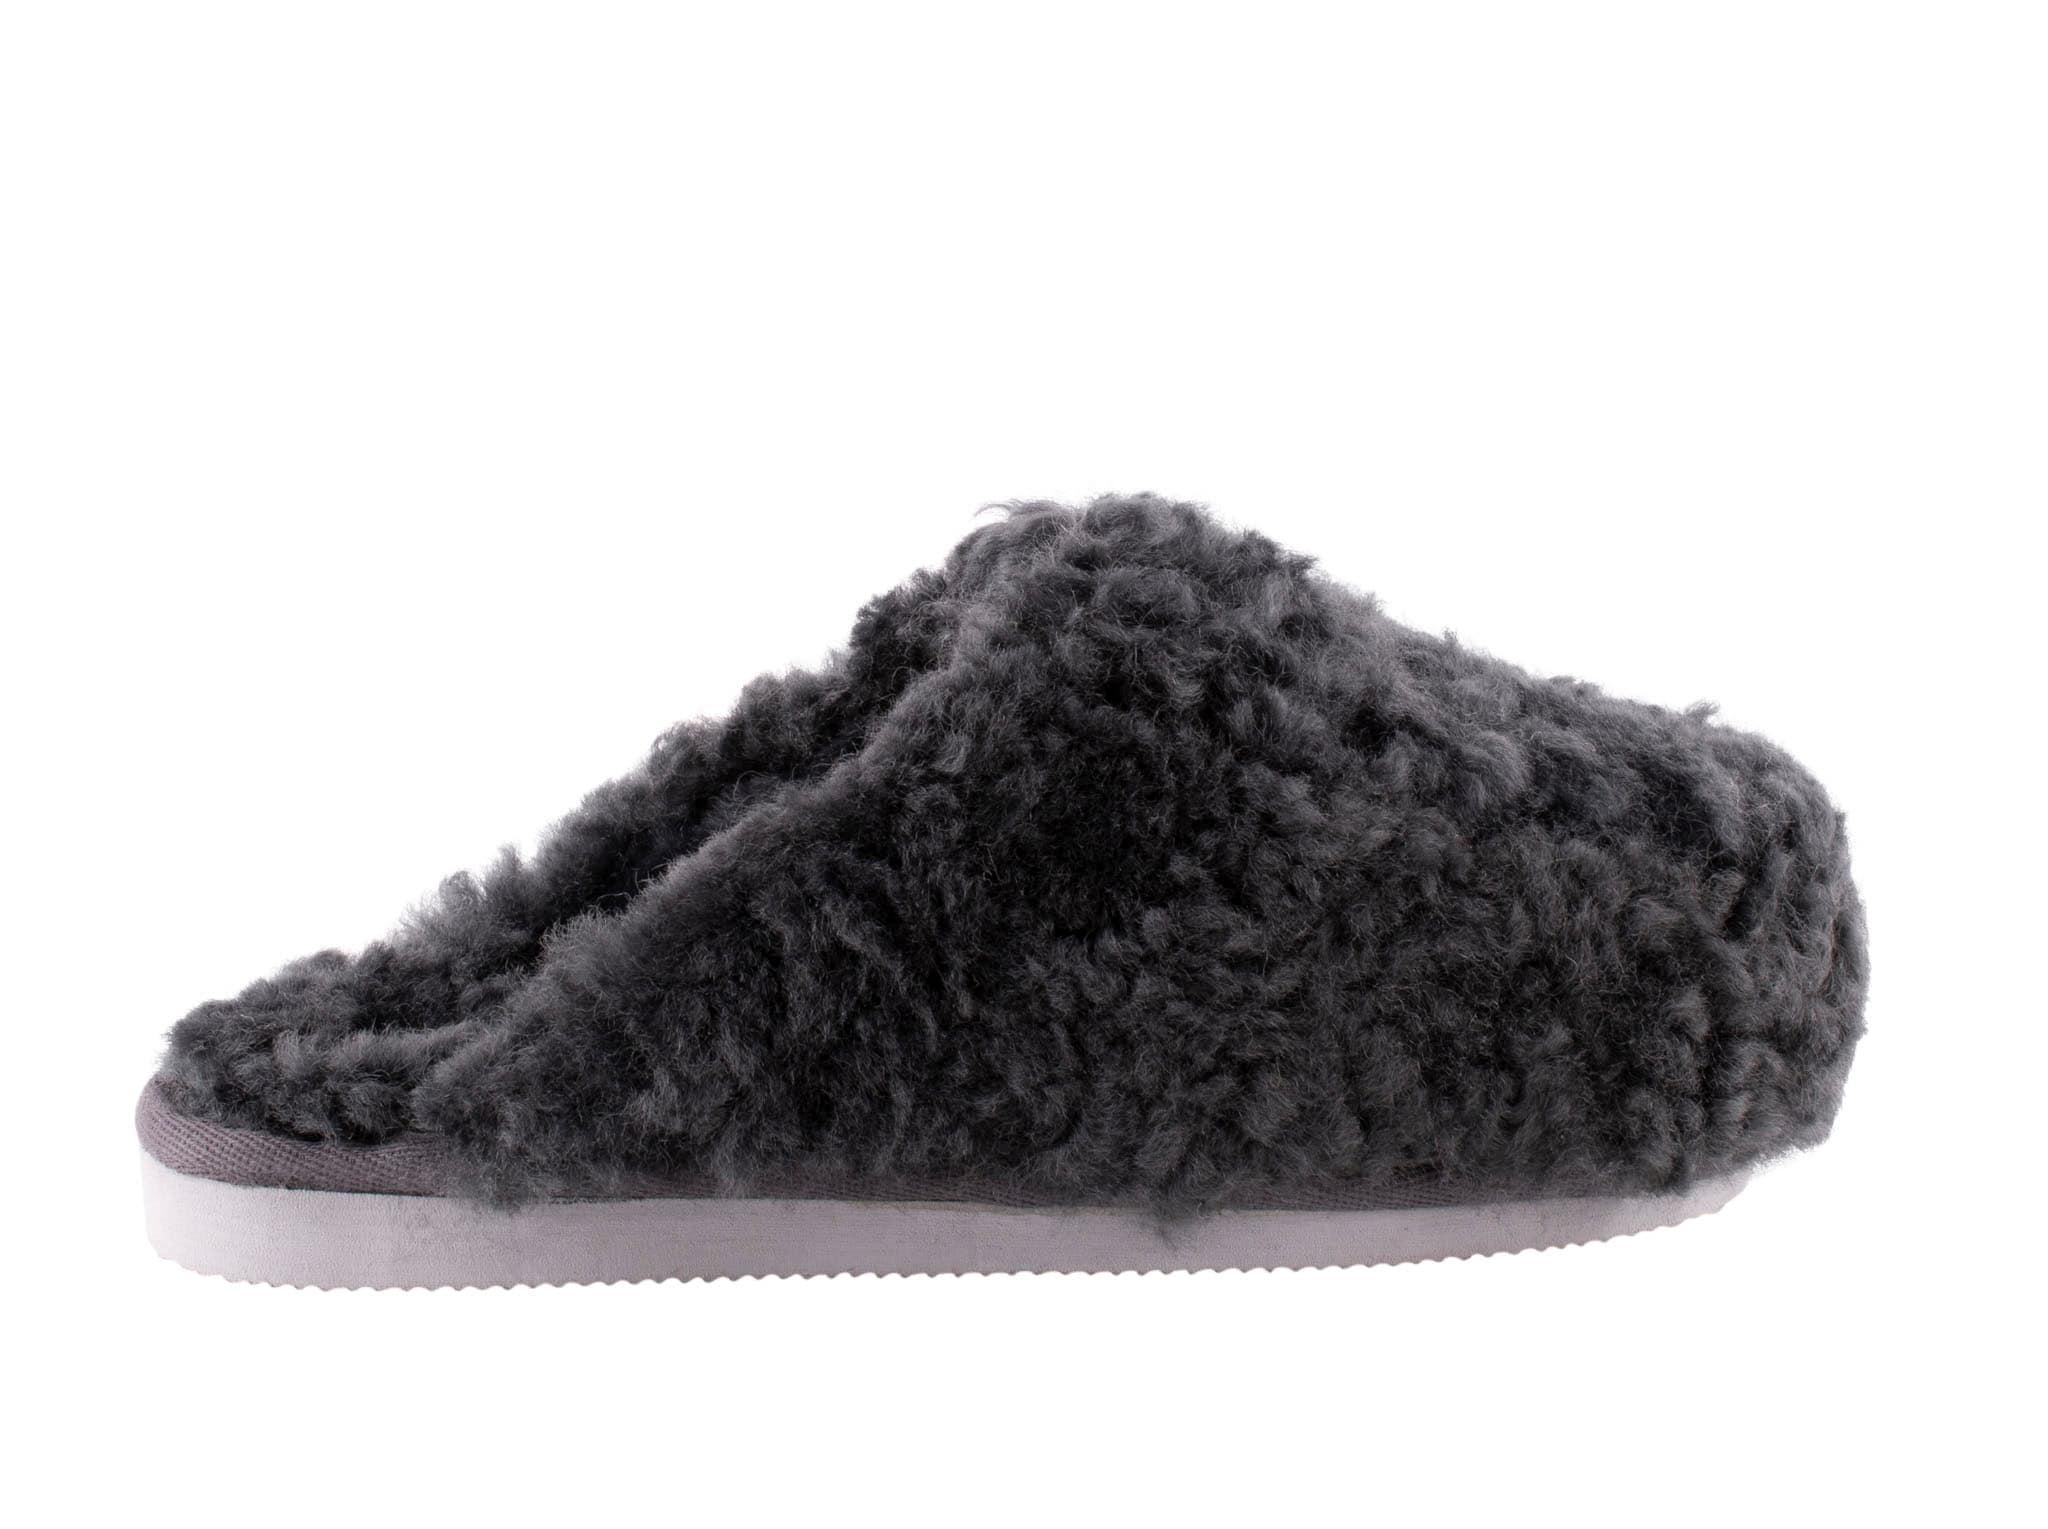 Jenny sheepskin slippers